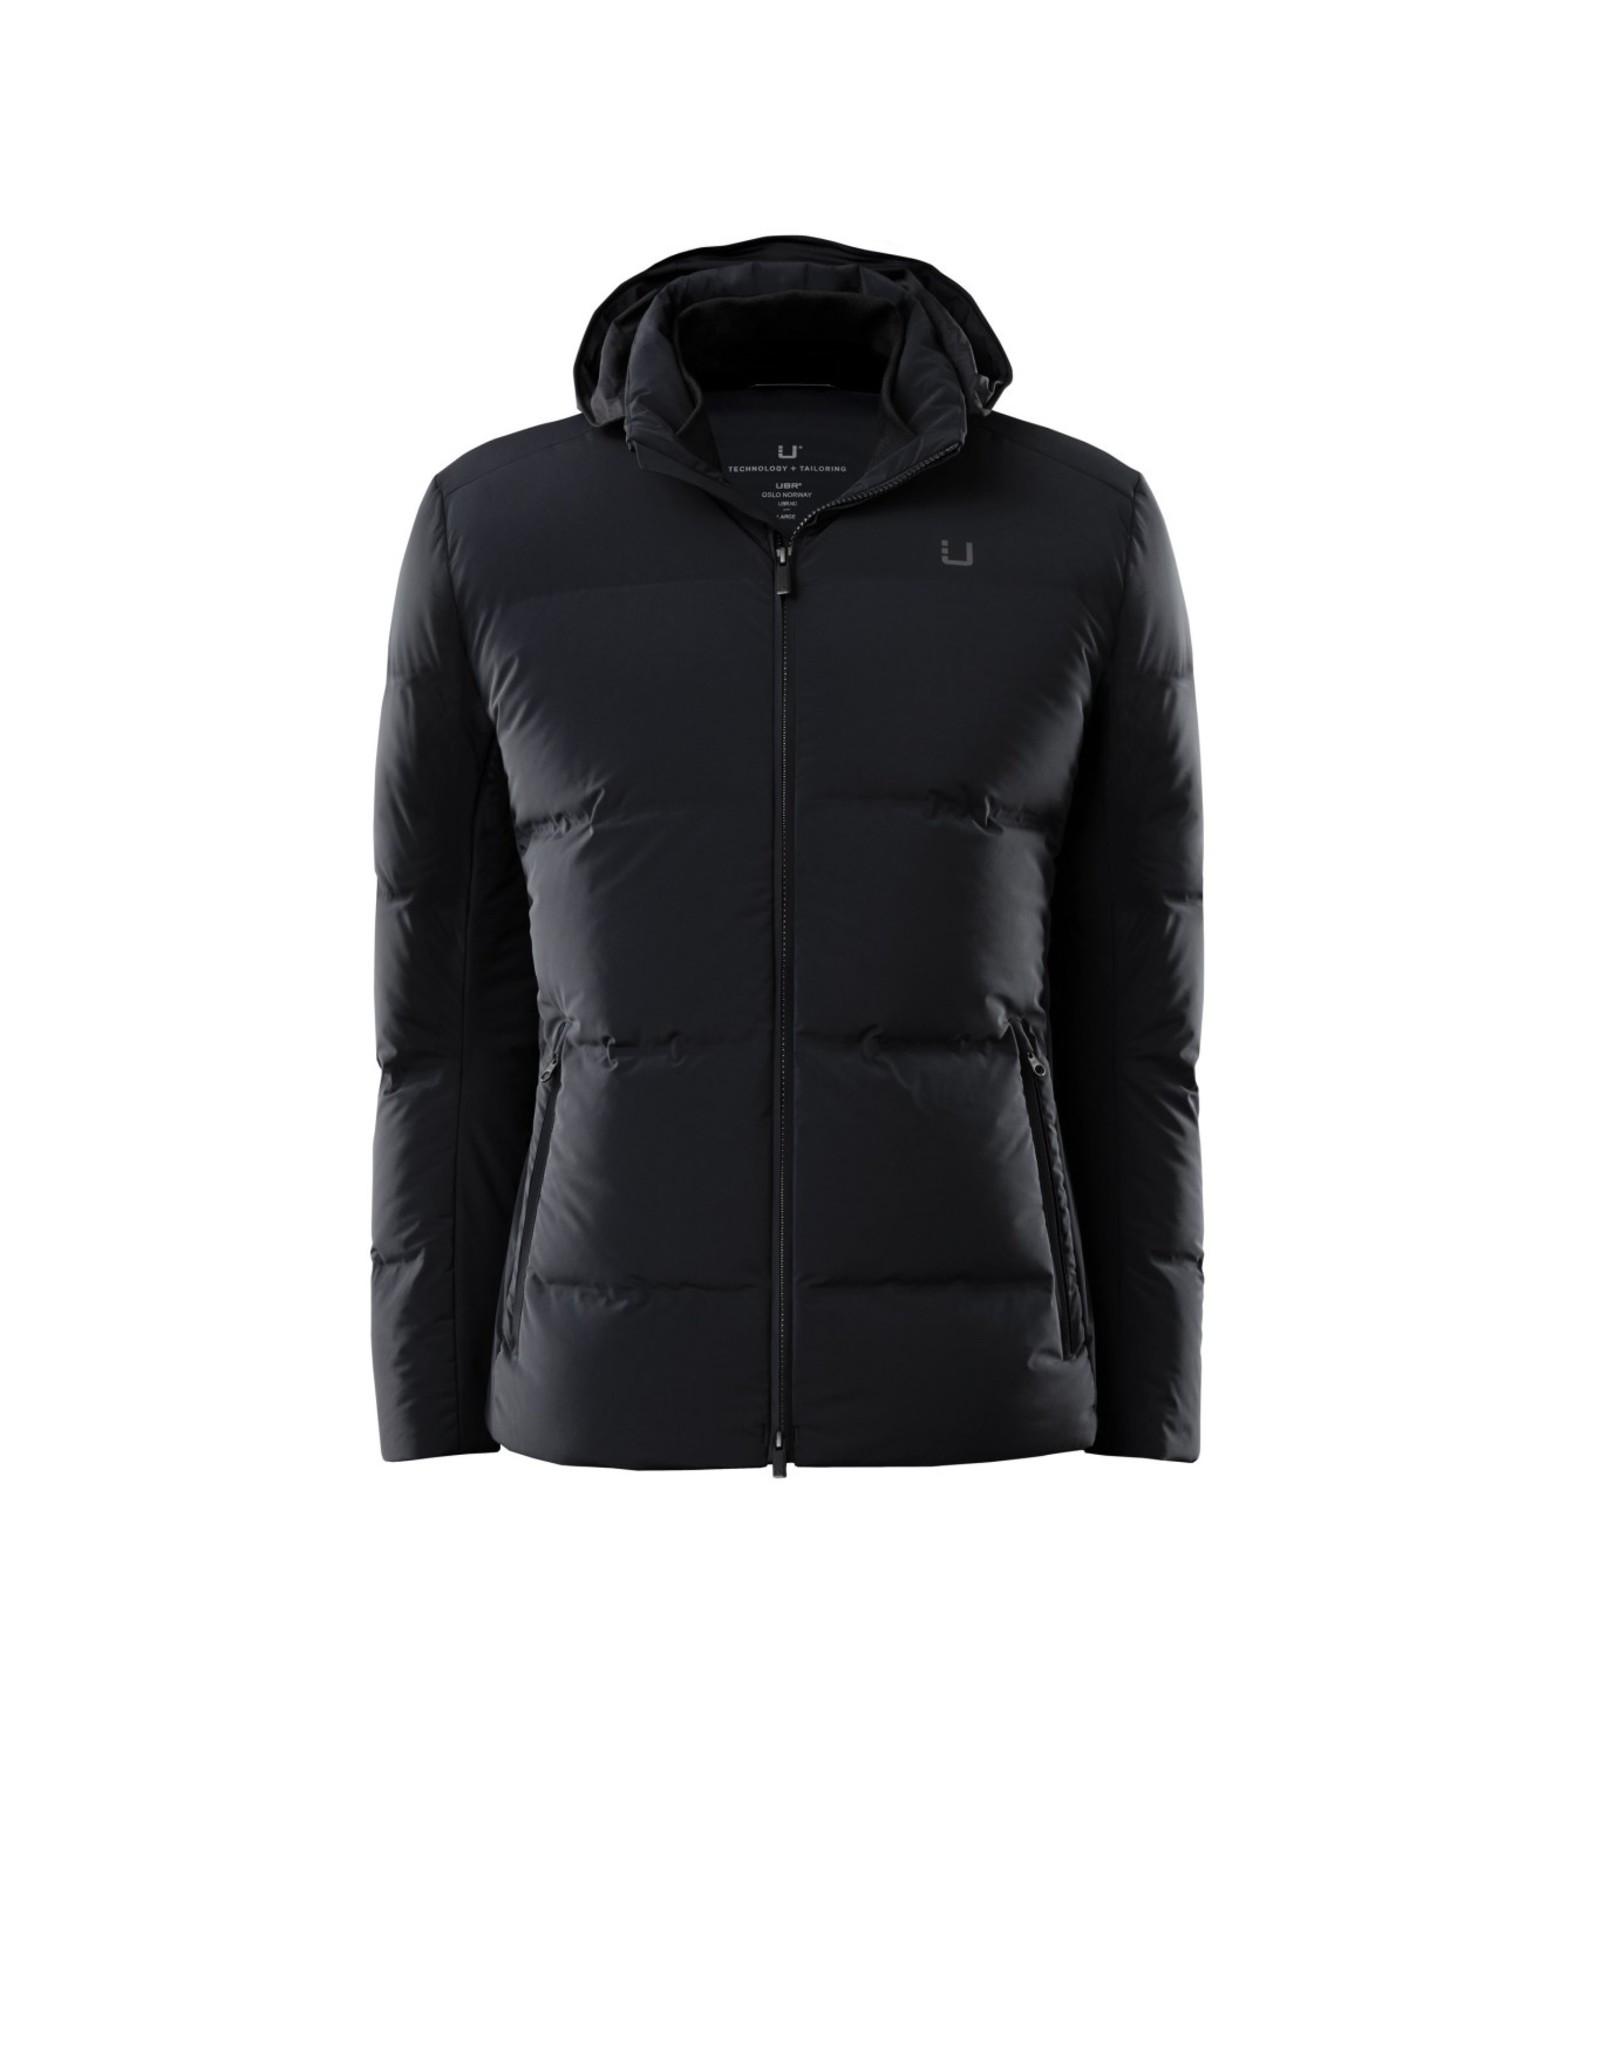 UBR UBR parka Bolt XP Down jacket black